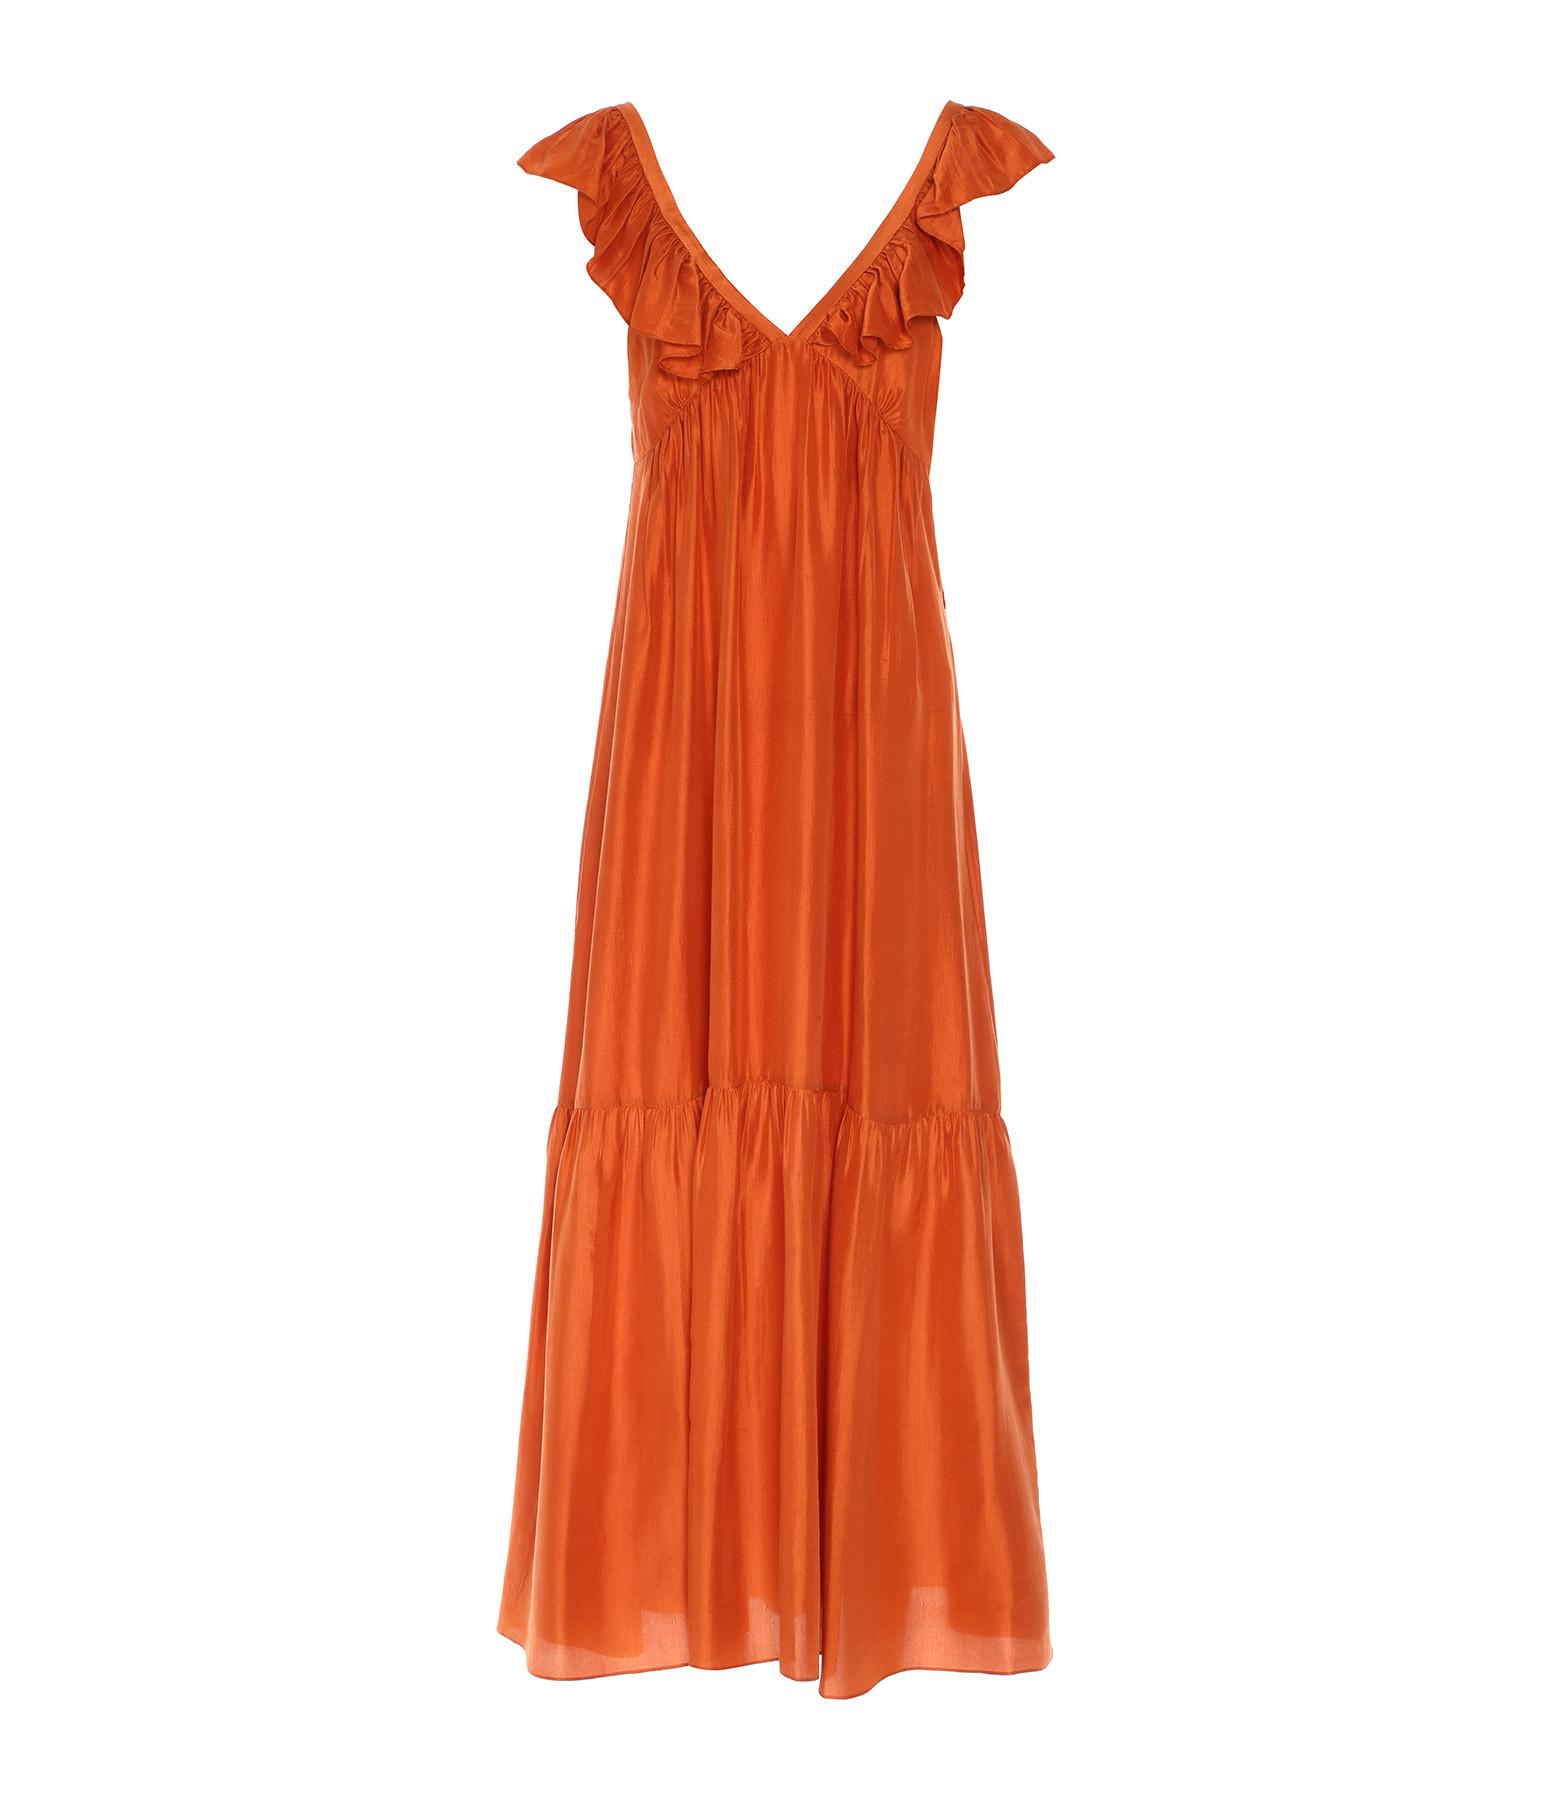 MASSCOB - Robe Acacia Tangerine